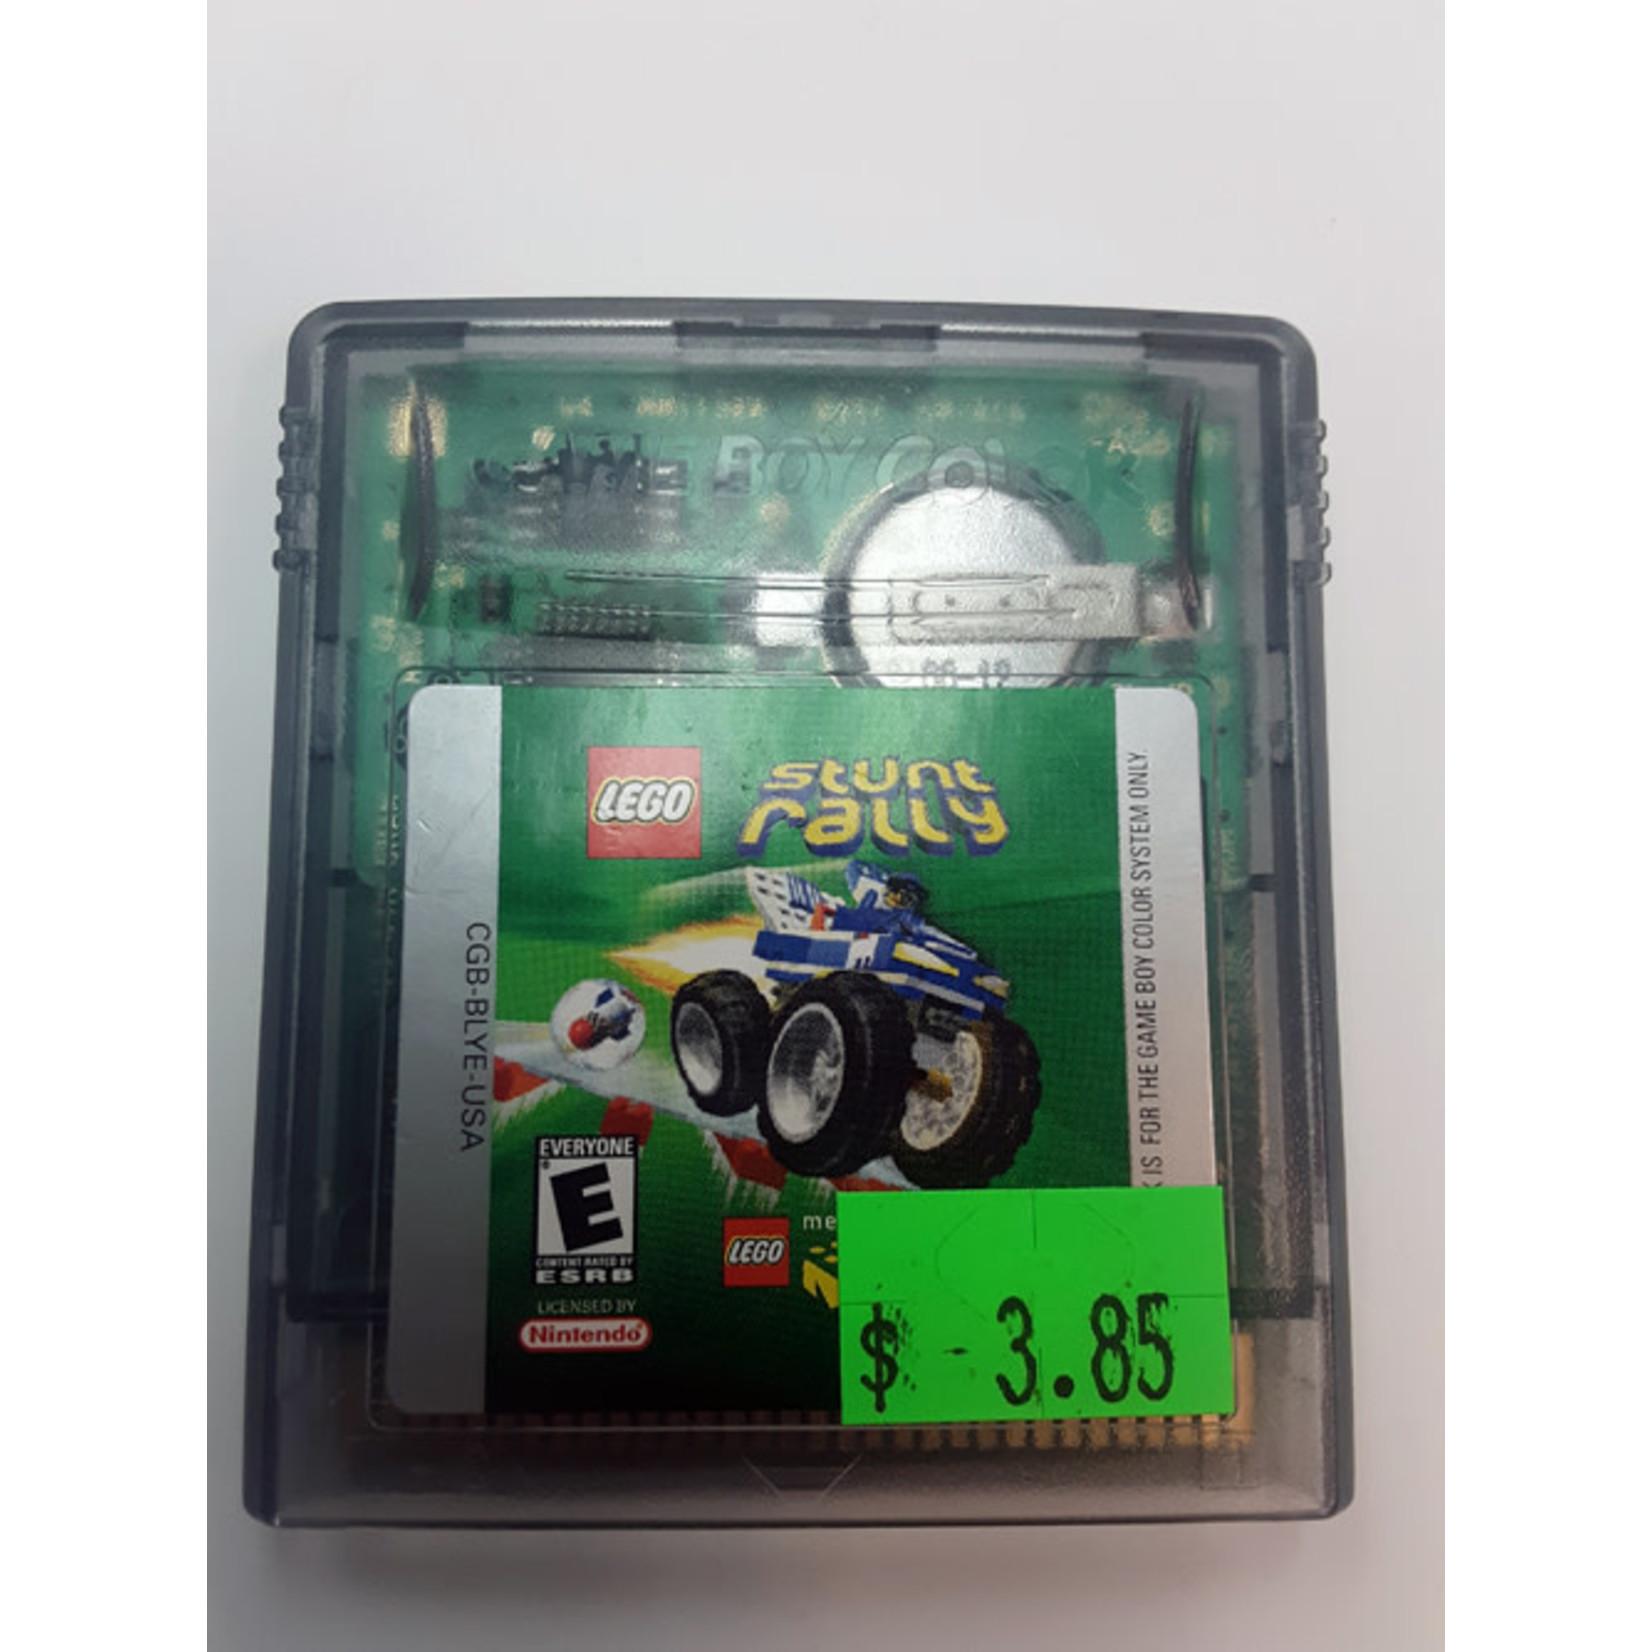 GBCU-LEGO Stunt rally (cartridge)